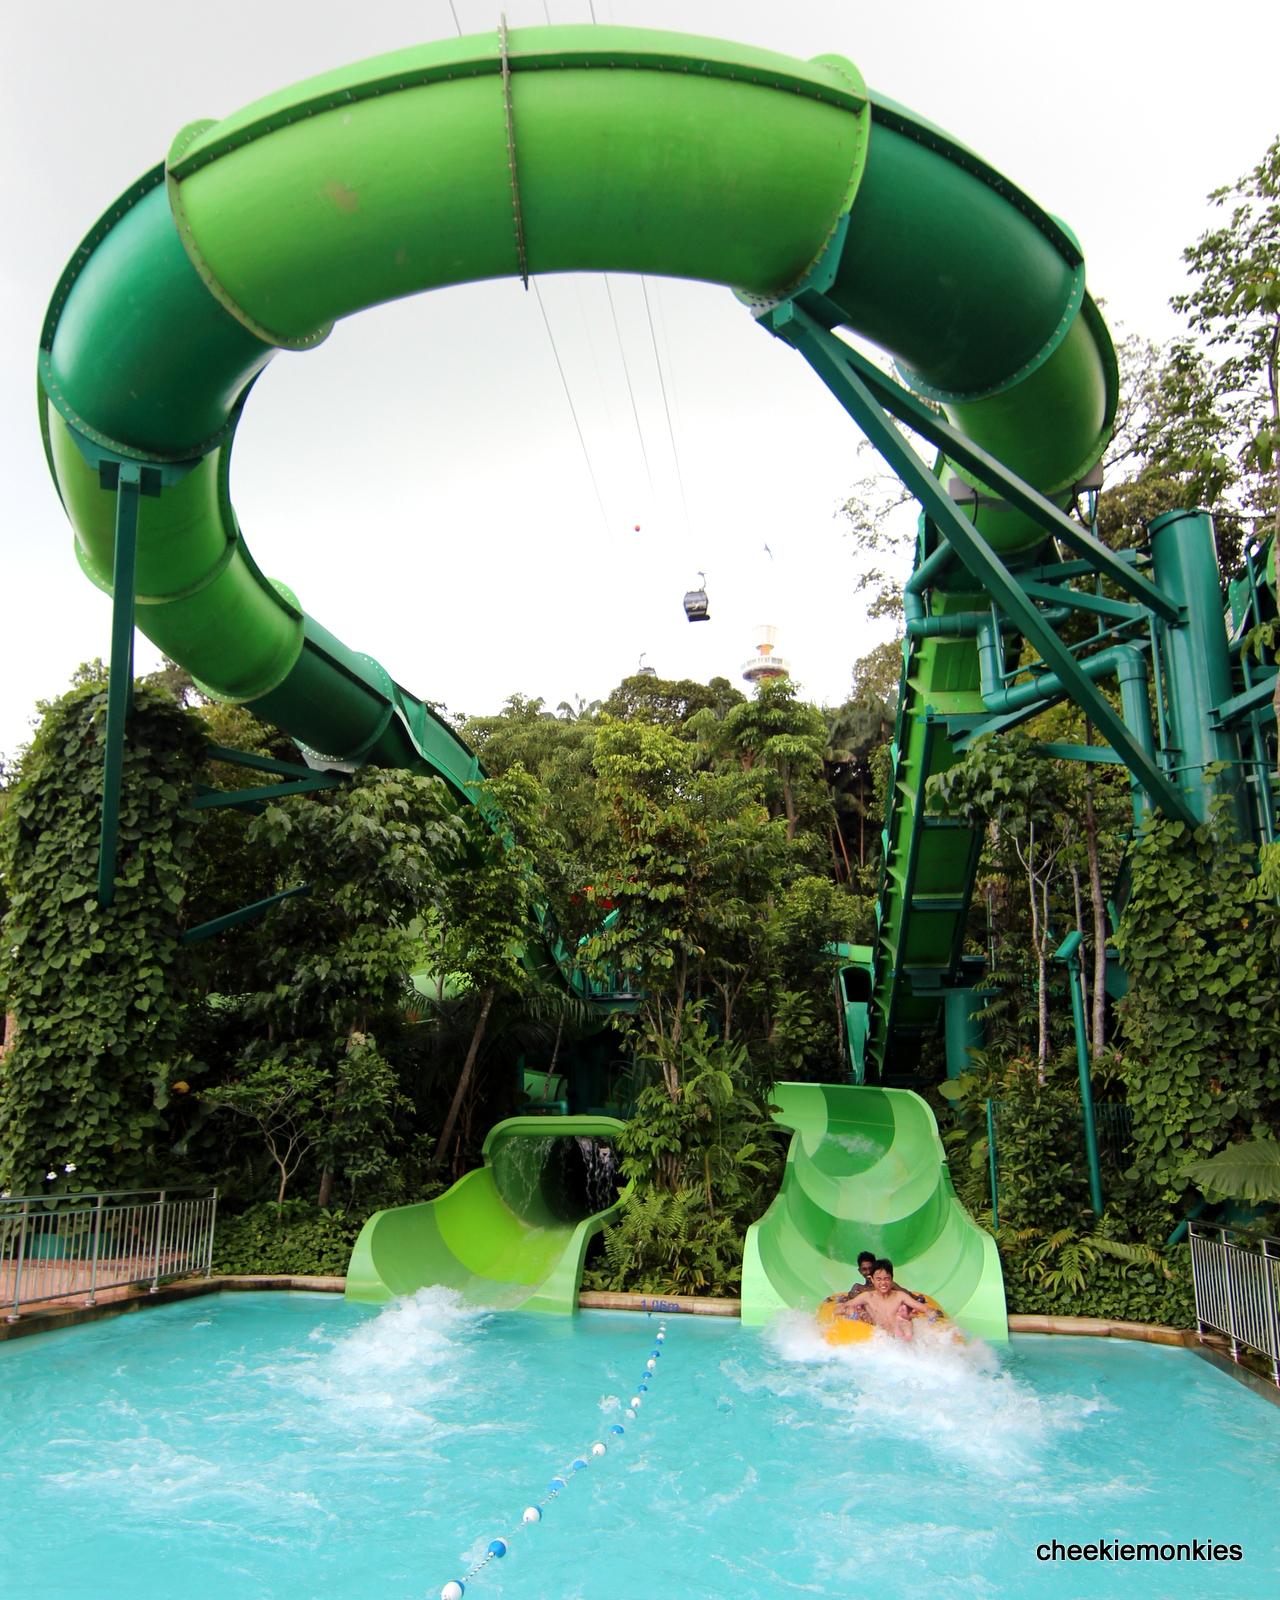 Cheekiemonkies Singapore Parenting Lifestyle Blog The Sampling Et Tiket Adventure Cove Park Of A Waterpark Cheekie Monkies